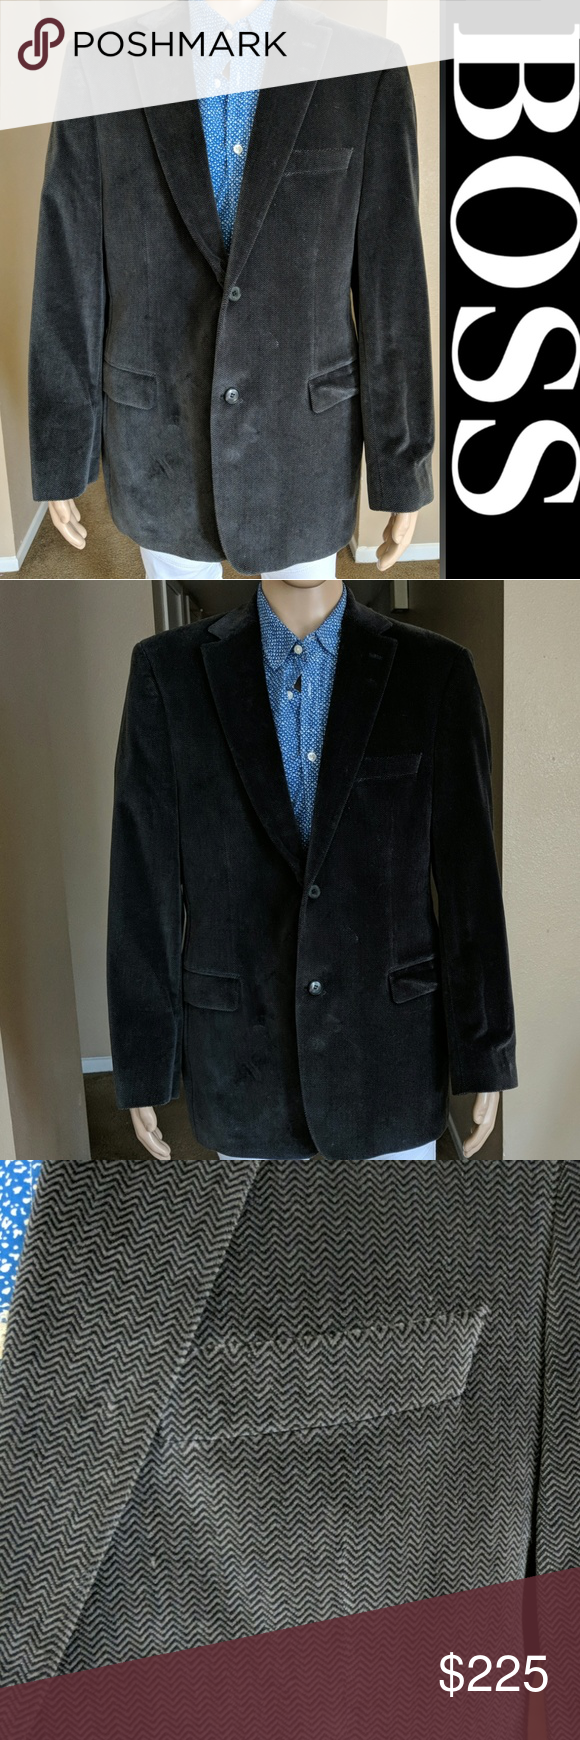 Hugo Boss Sport Jacket Sports Jacket Hugo Boss Suit Clothes Design [ 1740 x 580 Pixel ]